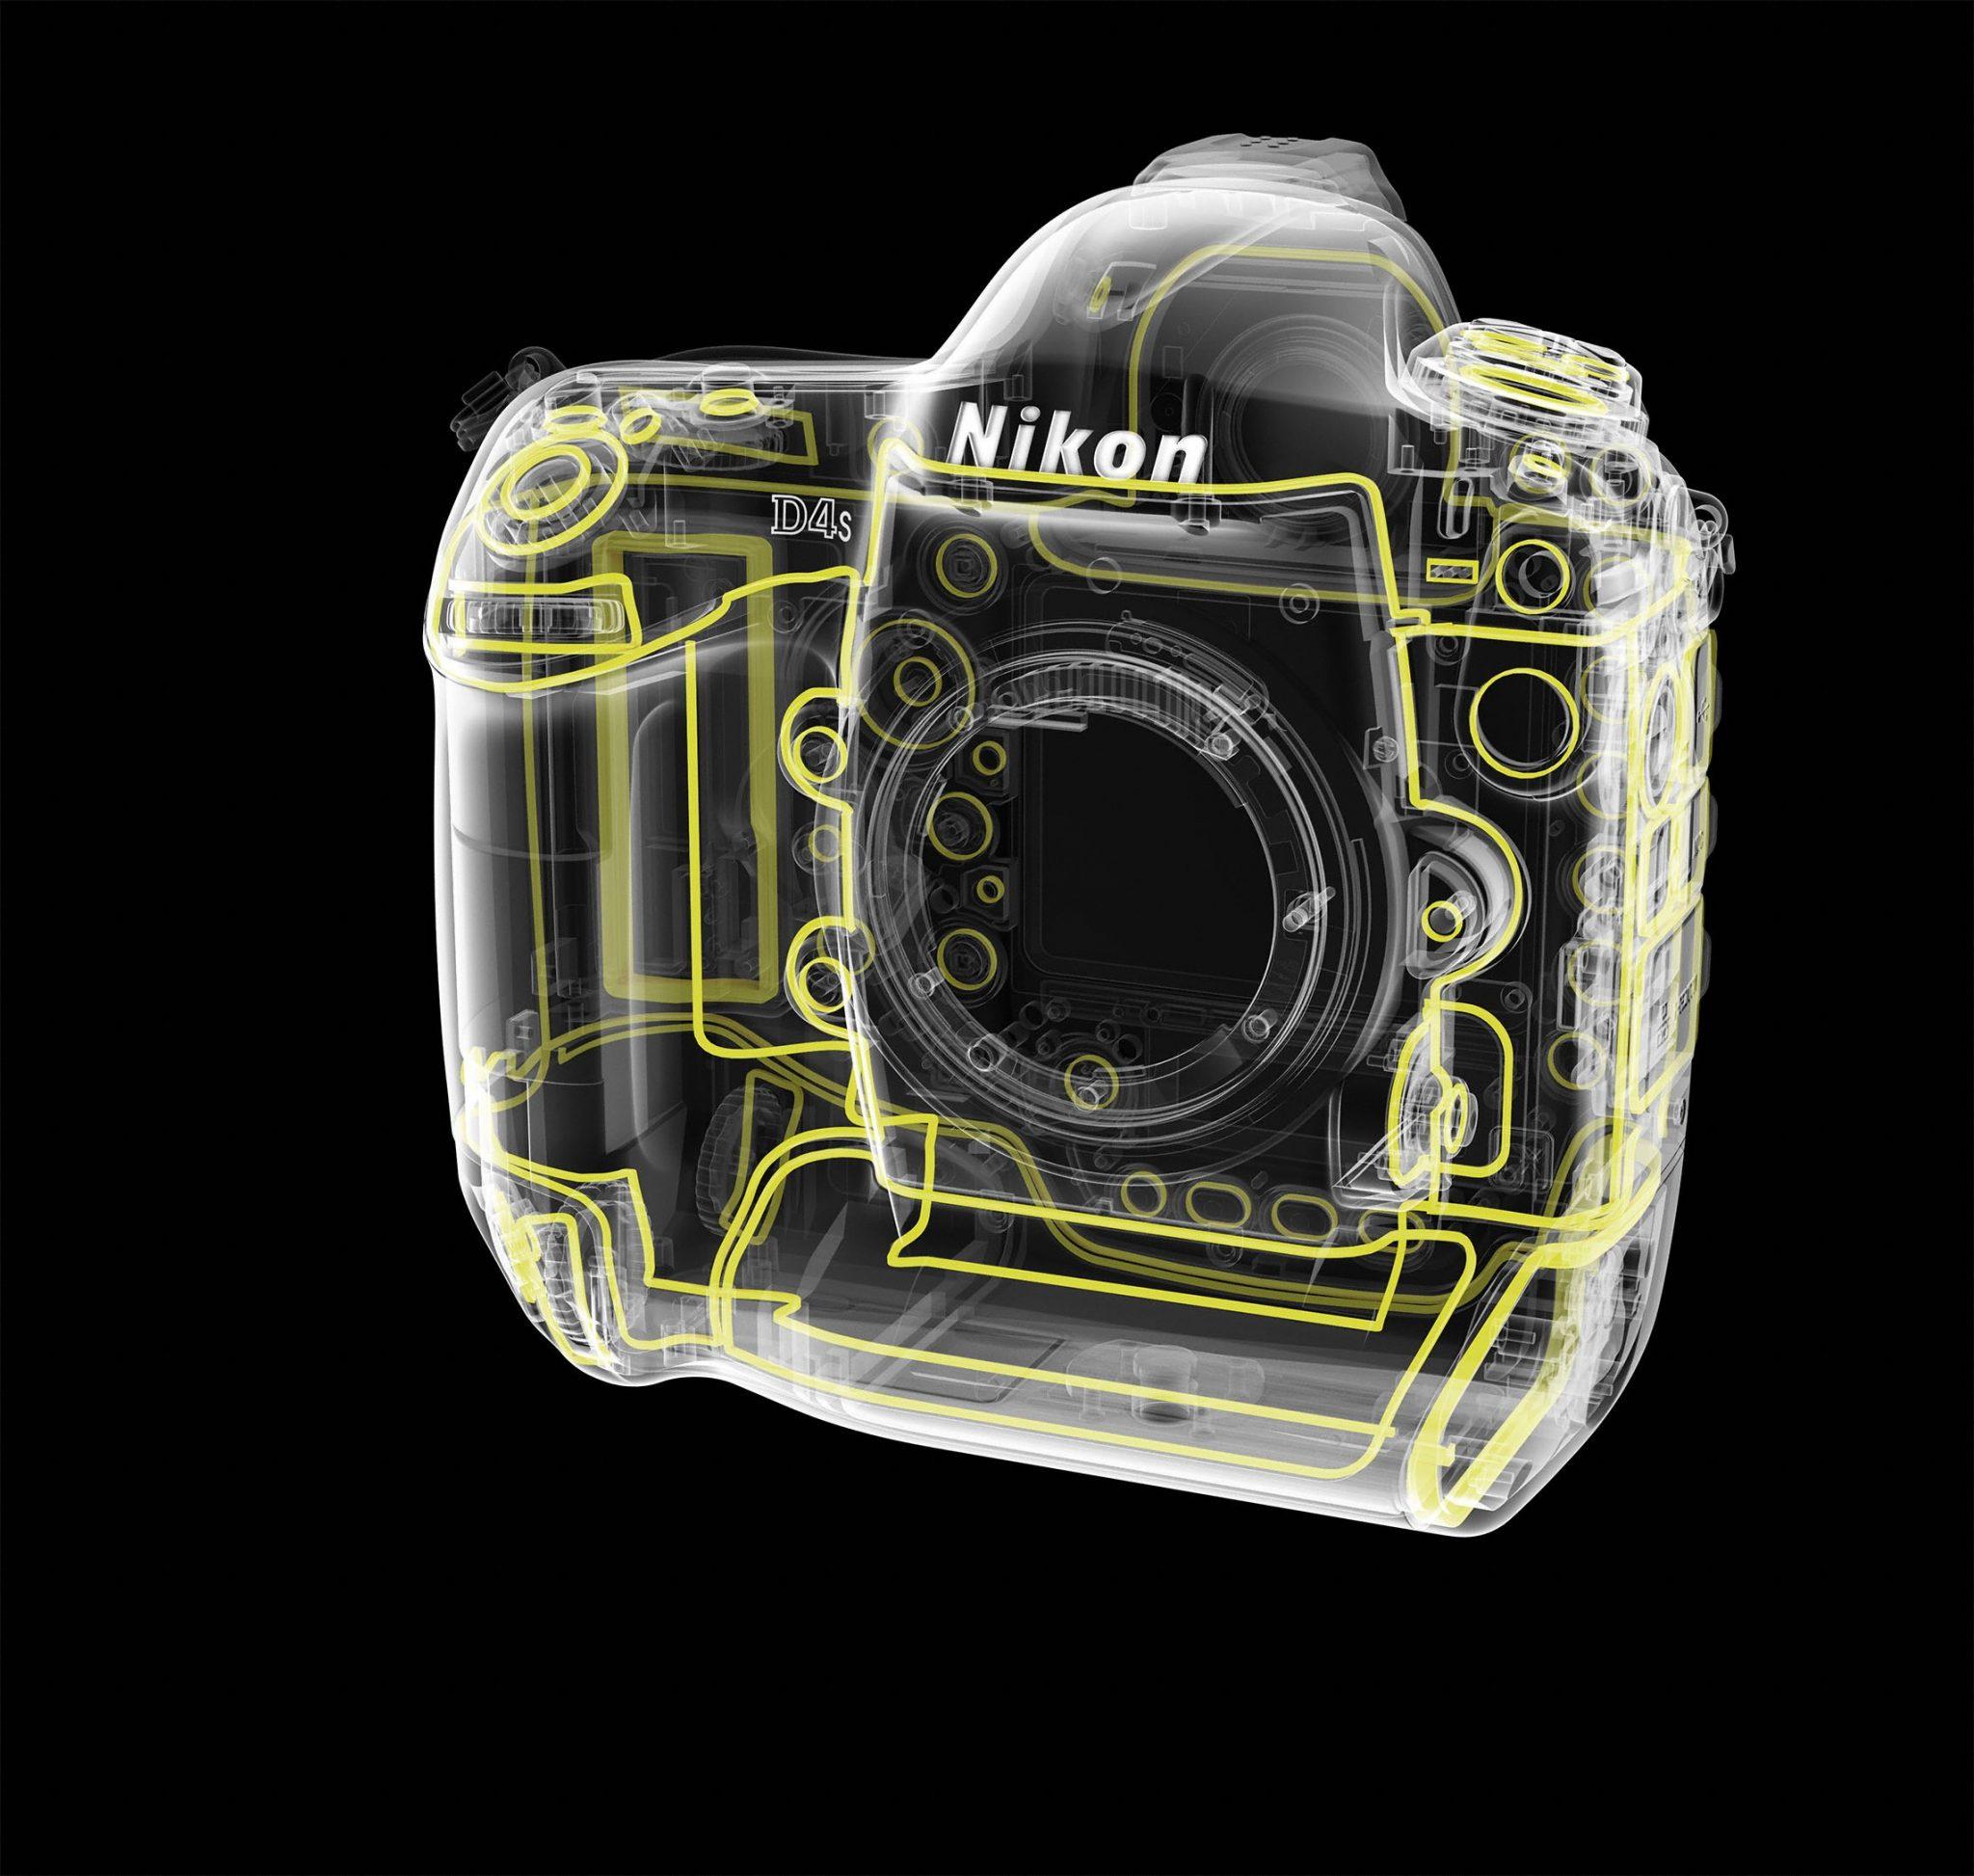 Nikon Body